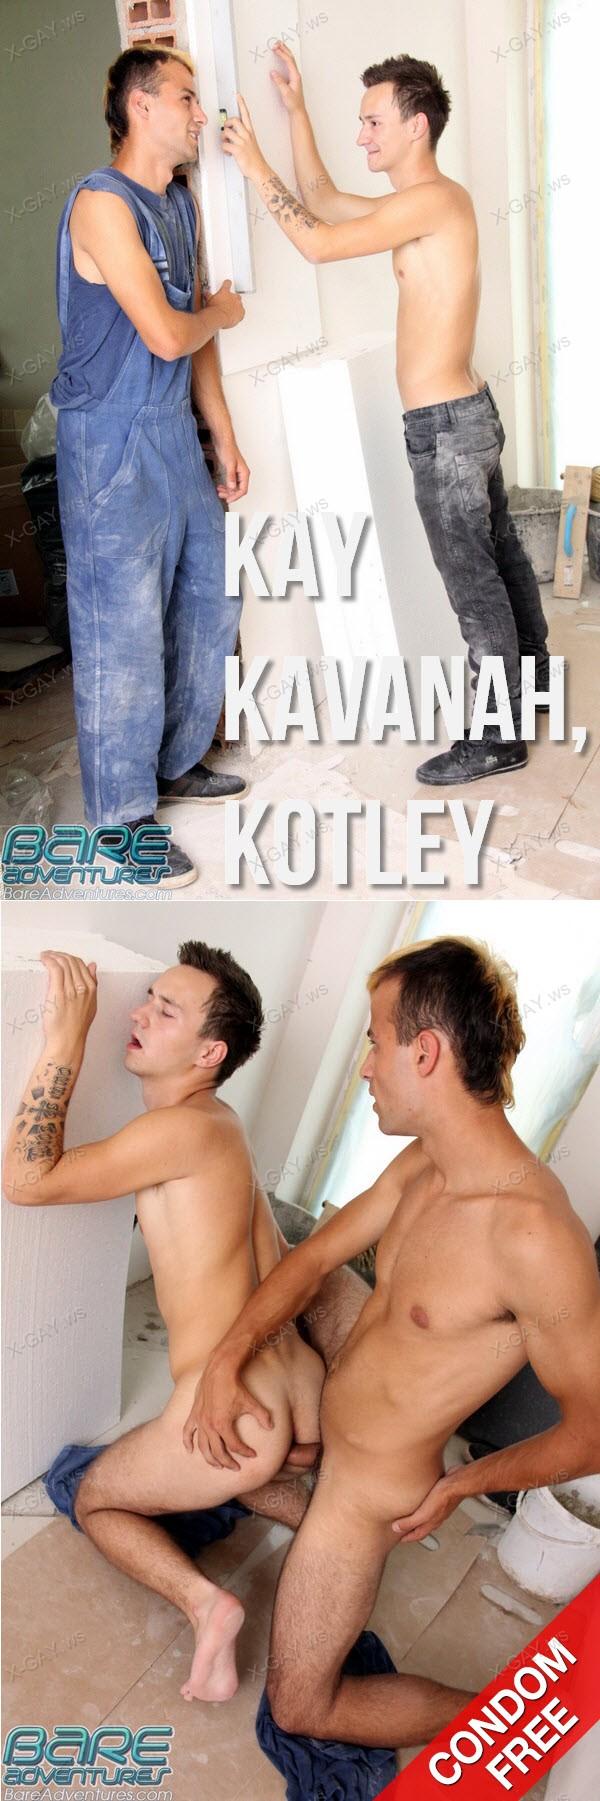 BareAdventures: Kay Kavanah, Kotley (Bareback)